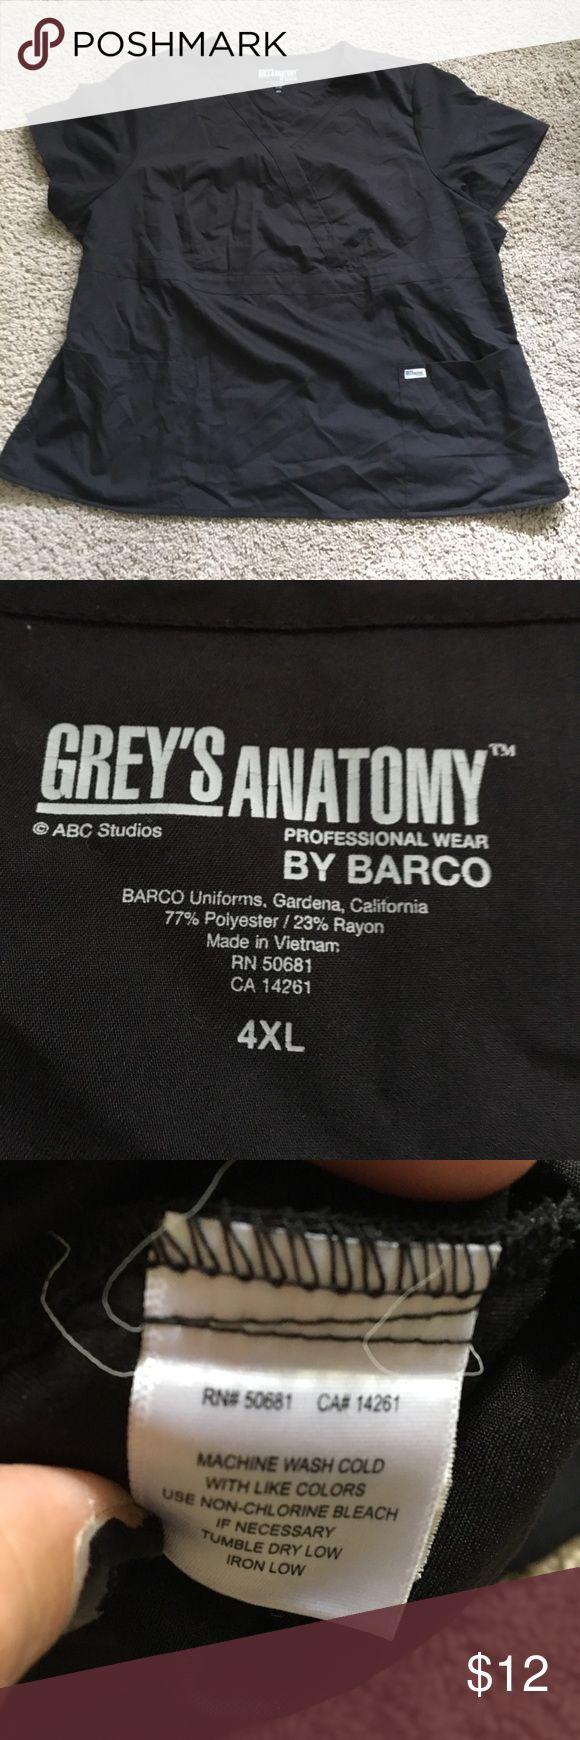 Greys anatomy sz 4x scrub top Grey's Anatomy black size 4X scrub top see our other scrubs would love to bundle and save you money grey's Anatomy Tops